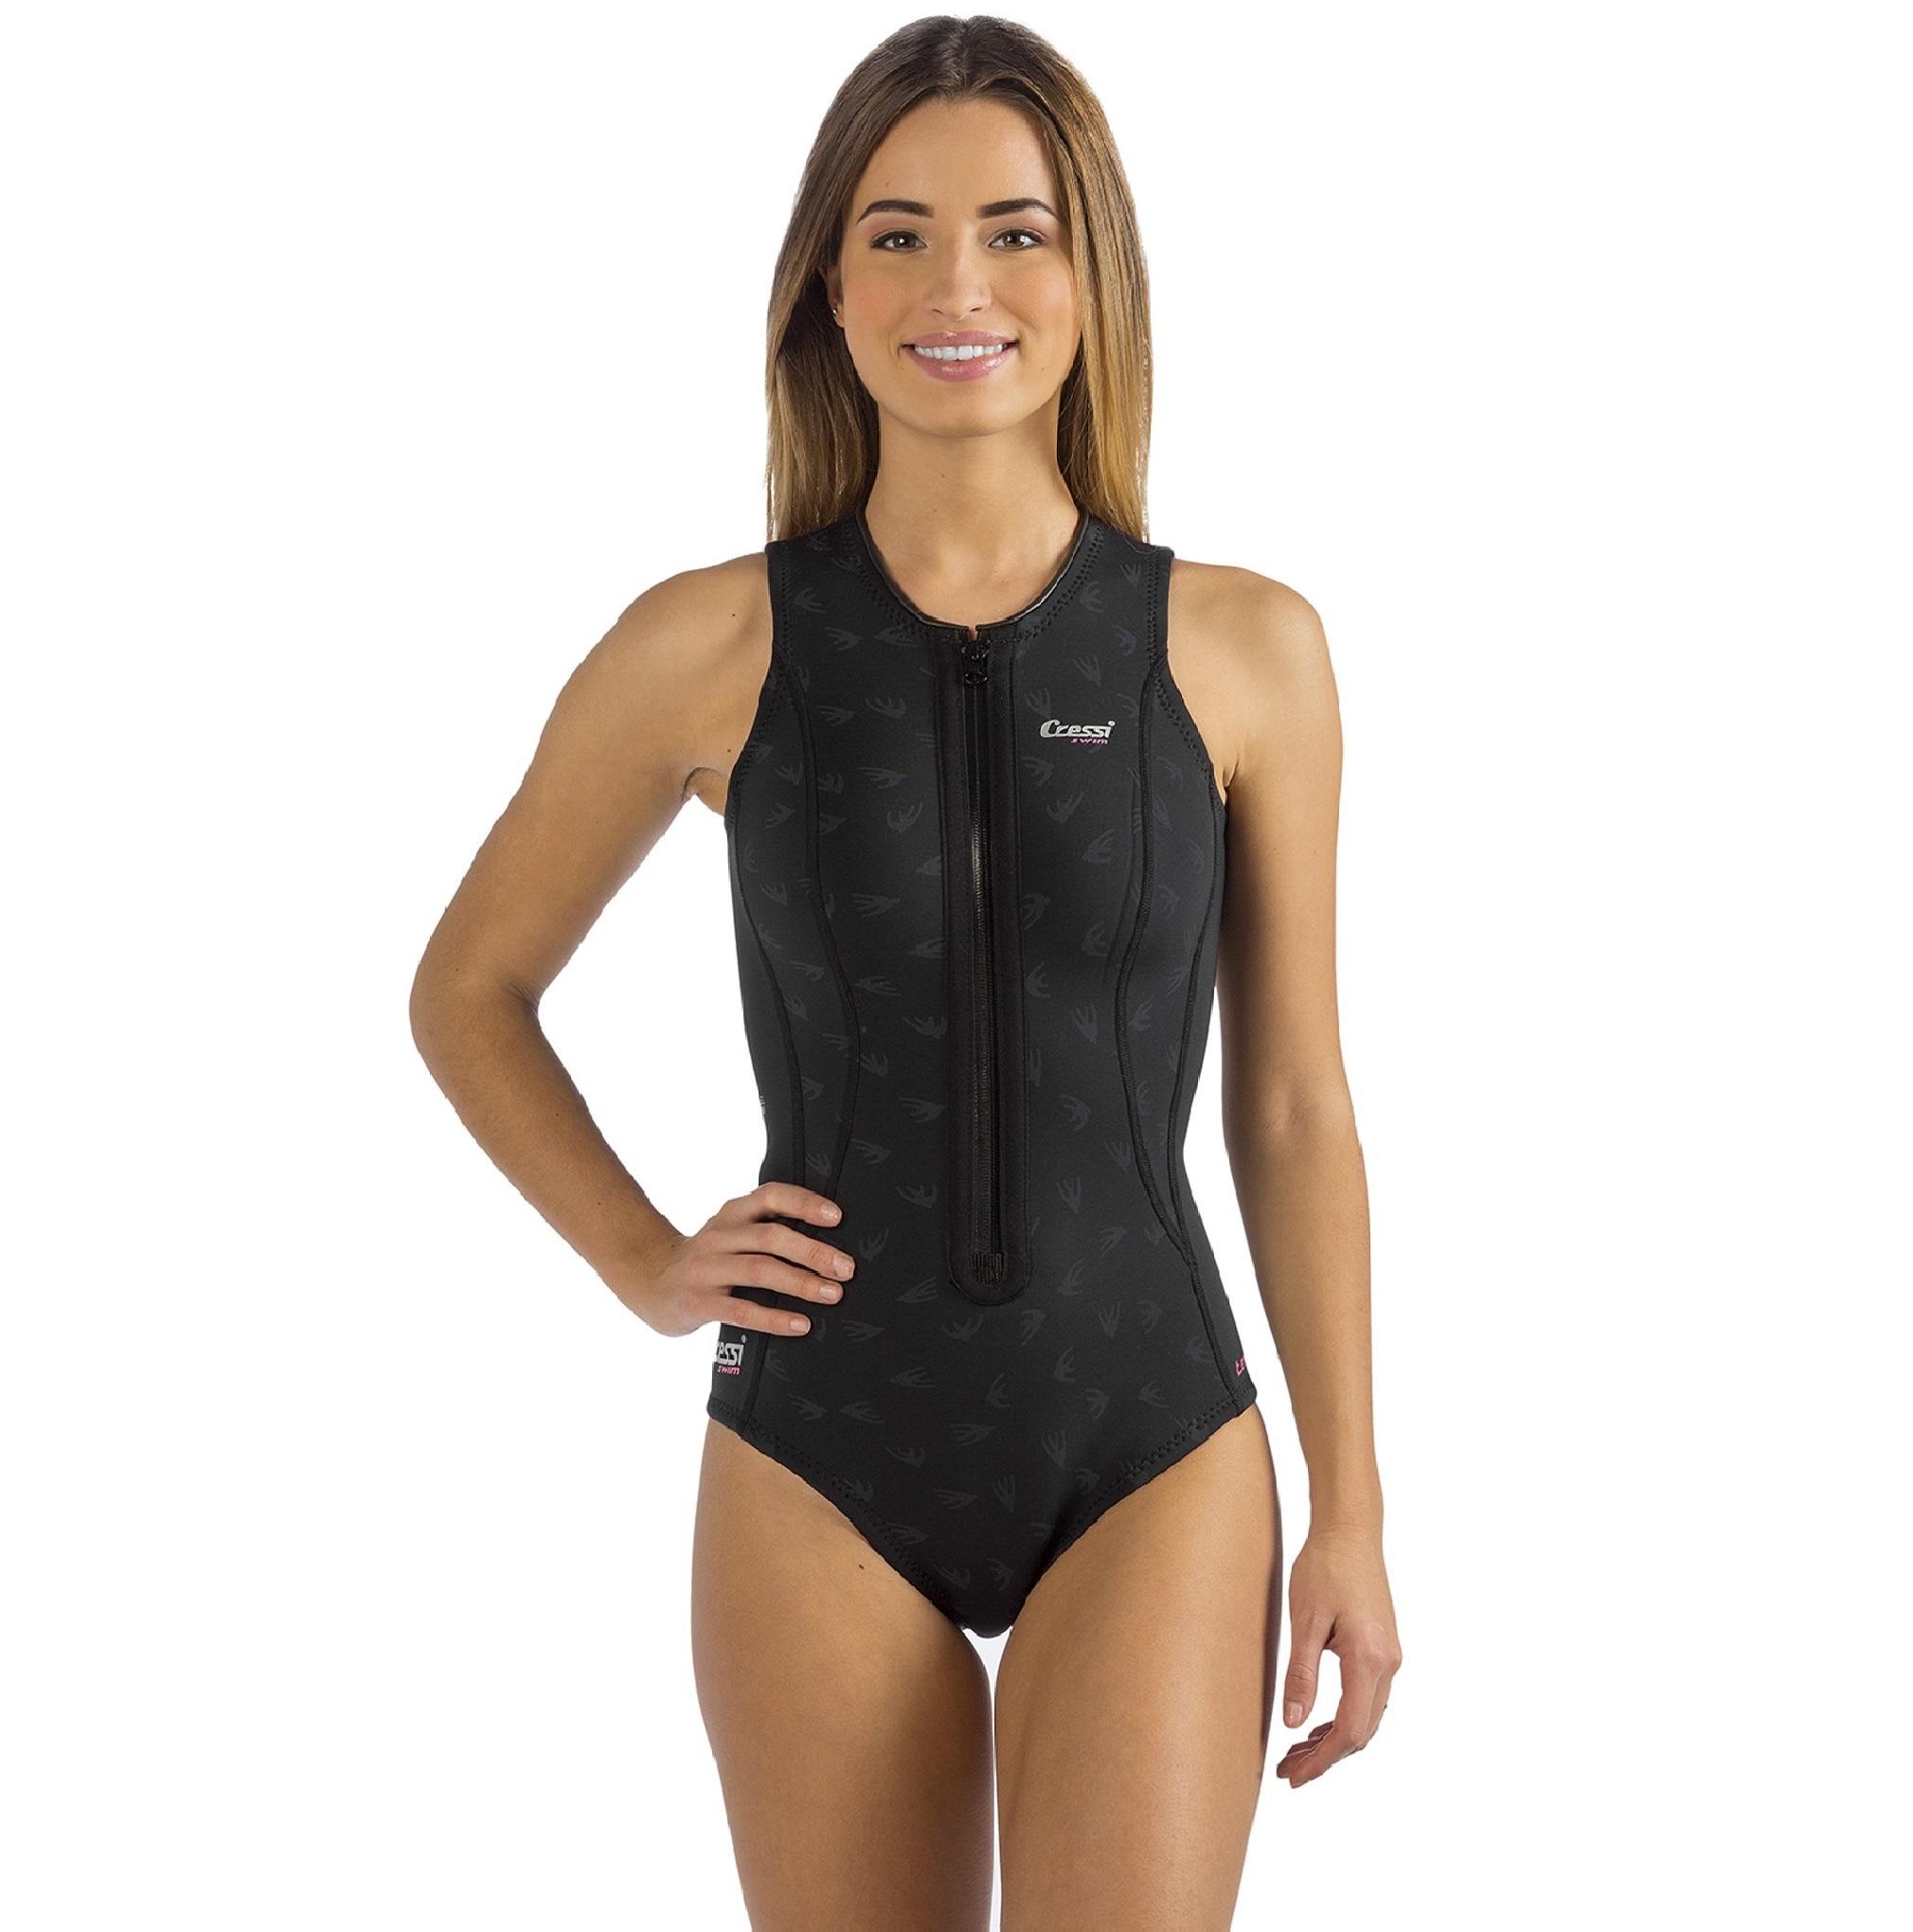 Termico Lady Cressi swimsuit